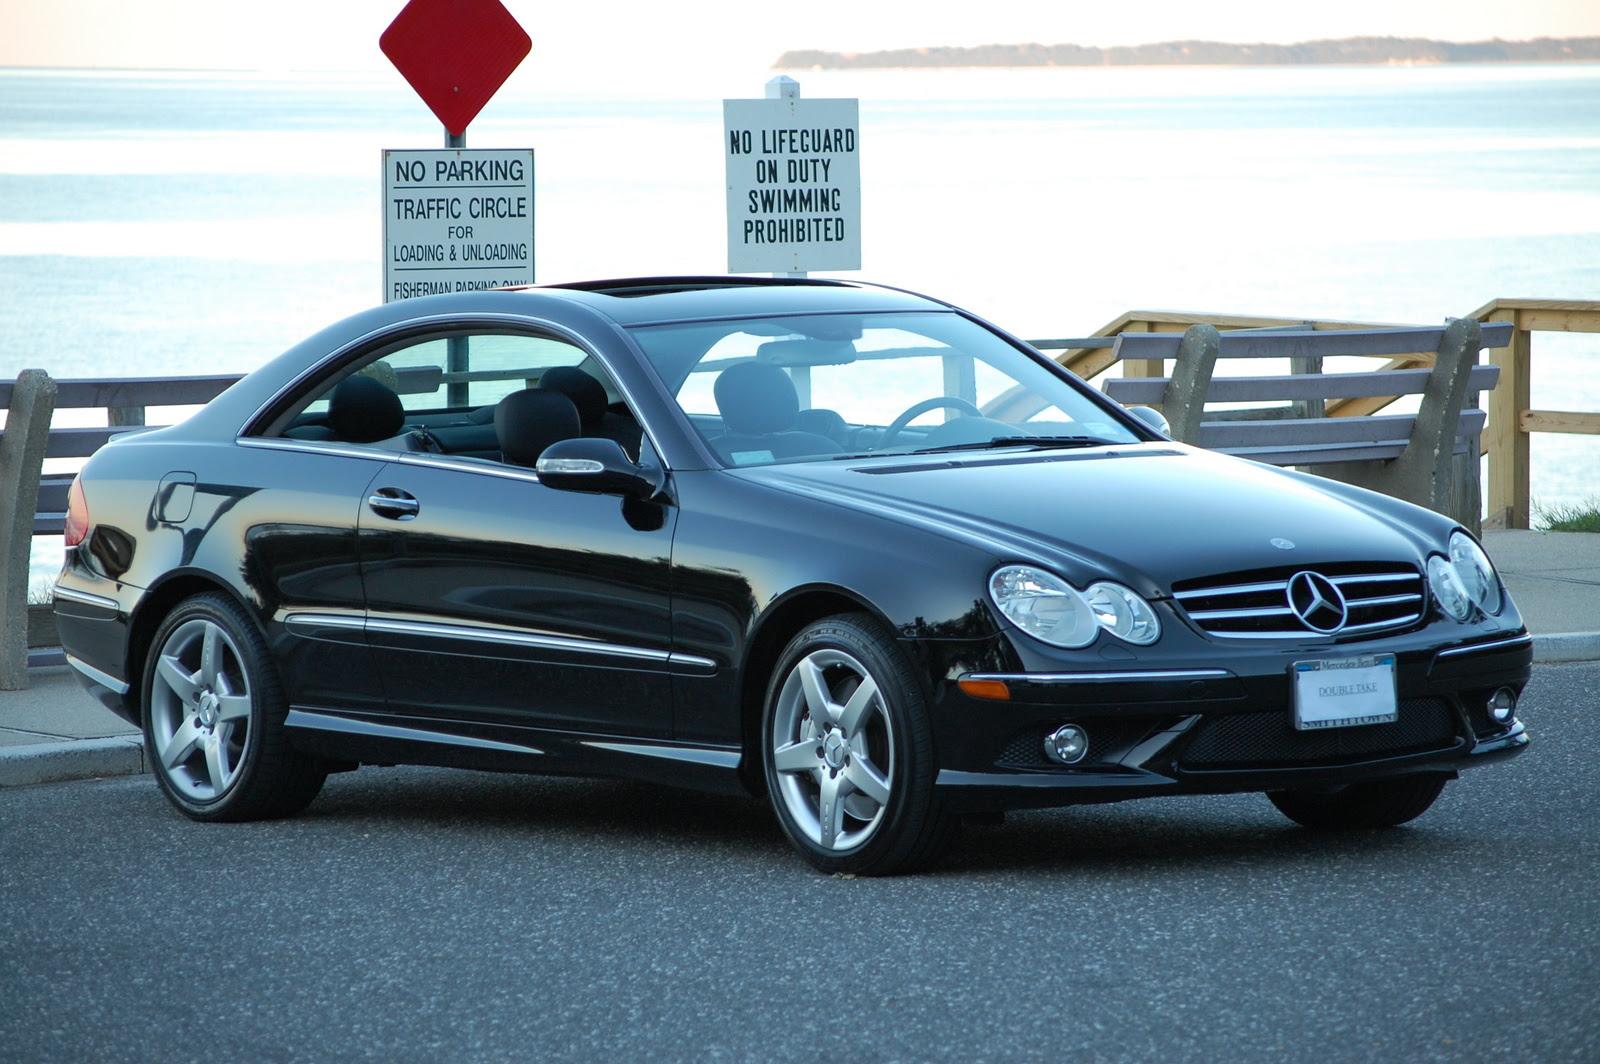 2006 Mercedes-Benz CLK-Class - Pictures - CarGurus